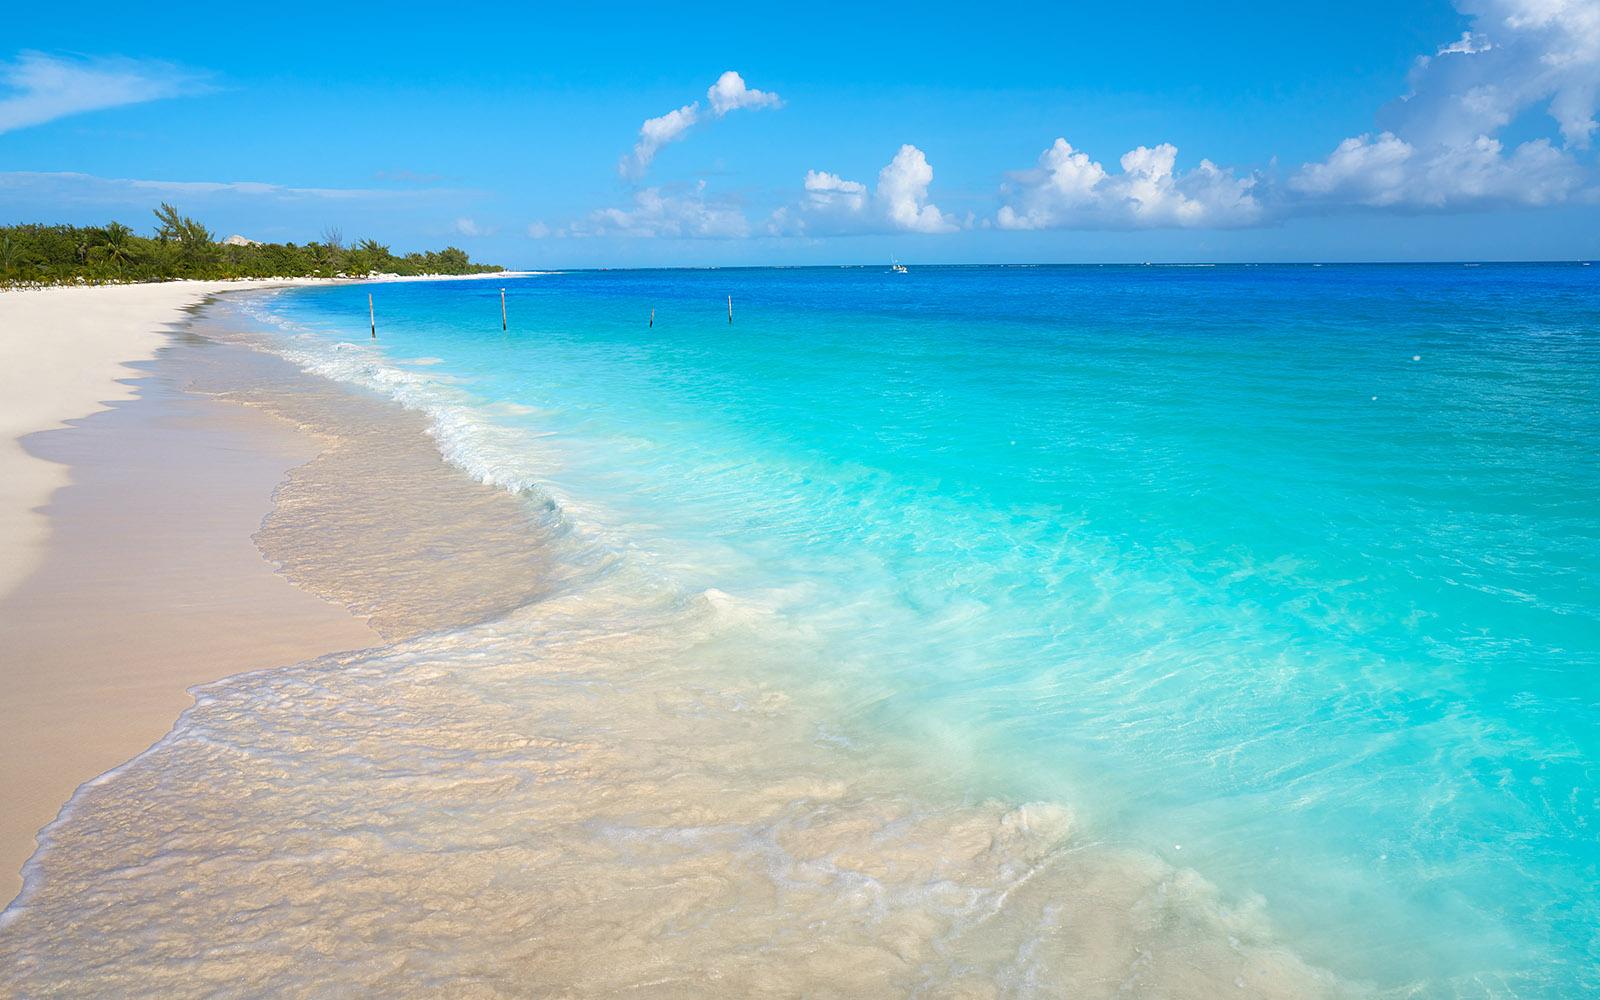 Agence tourisme francophone, excursions Playa del Carmen, guide Maya